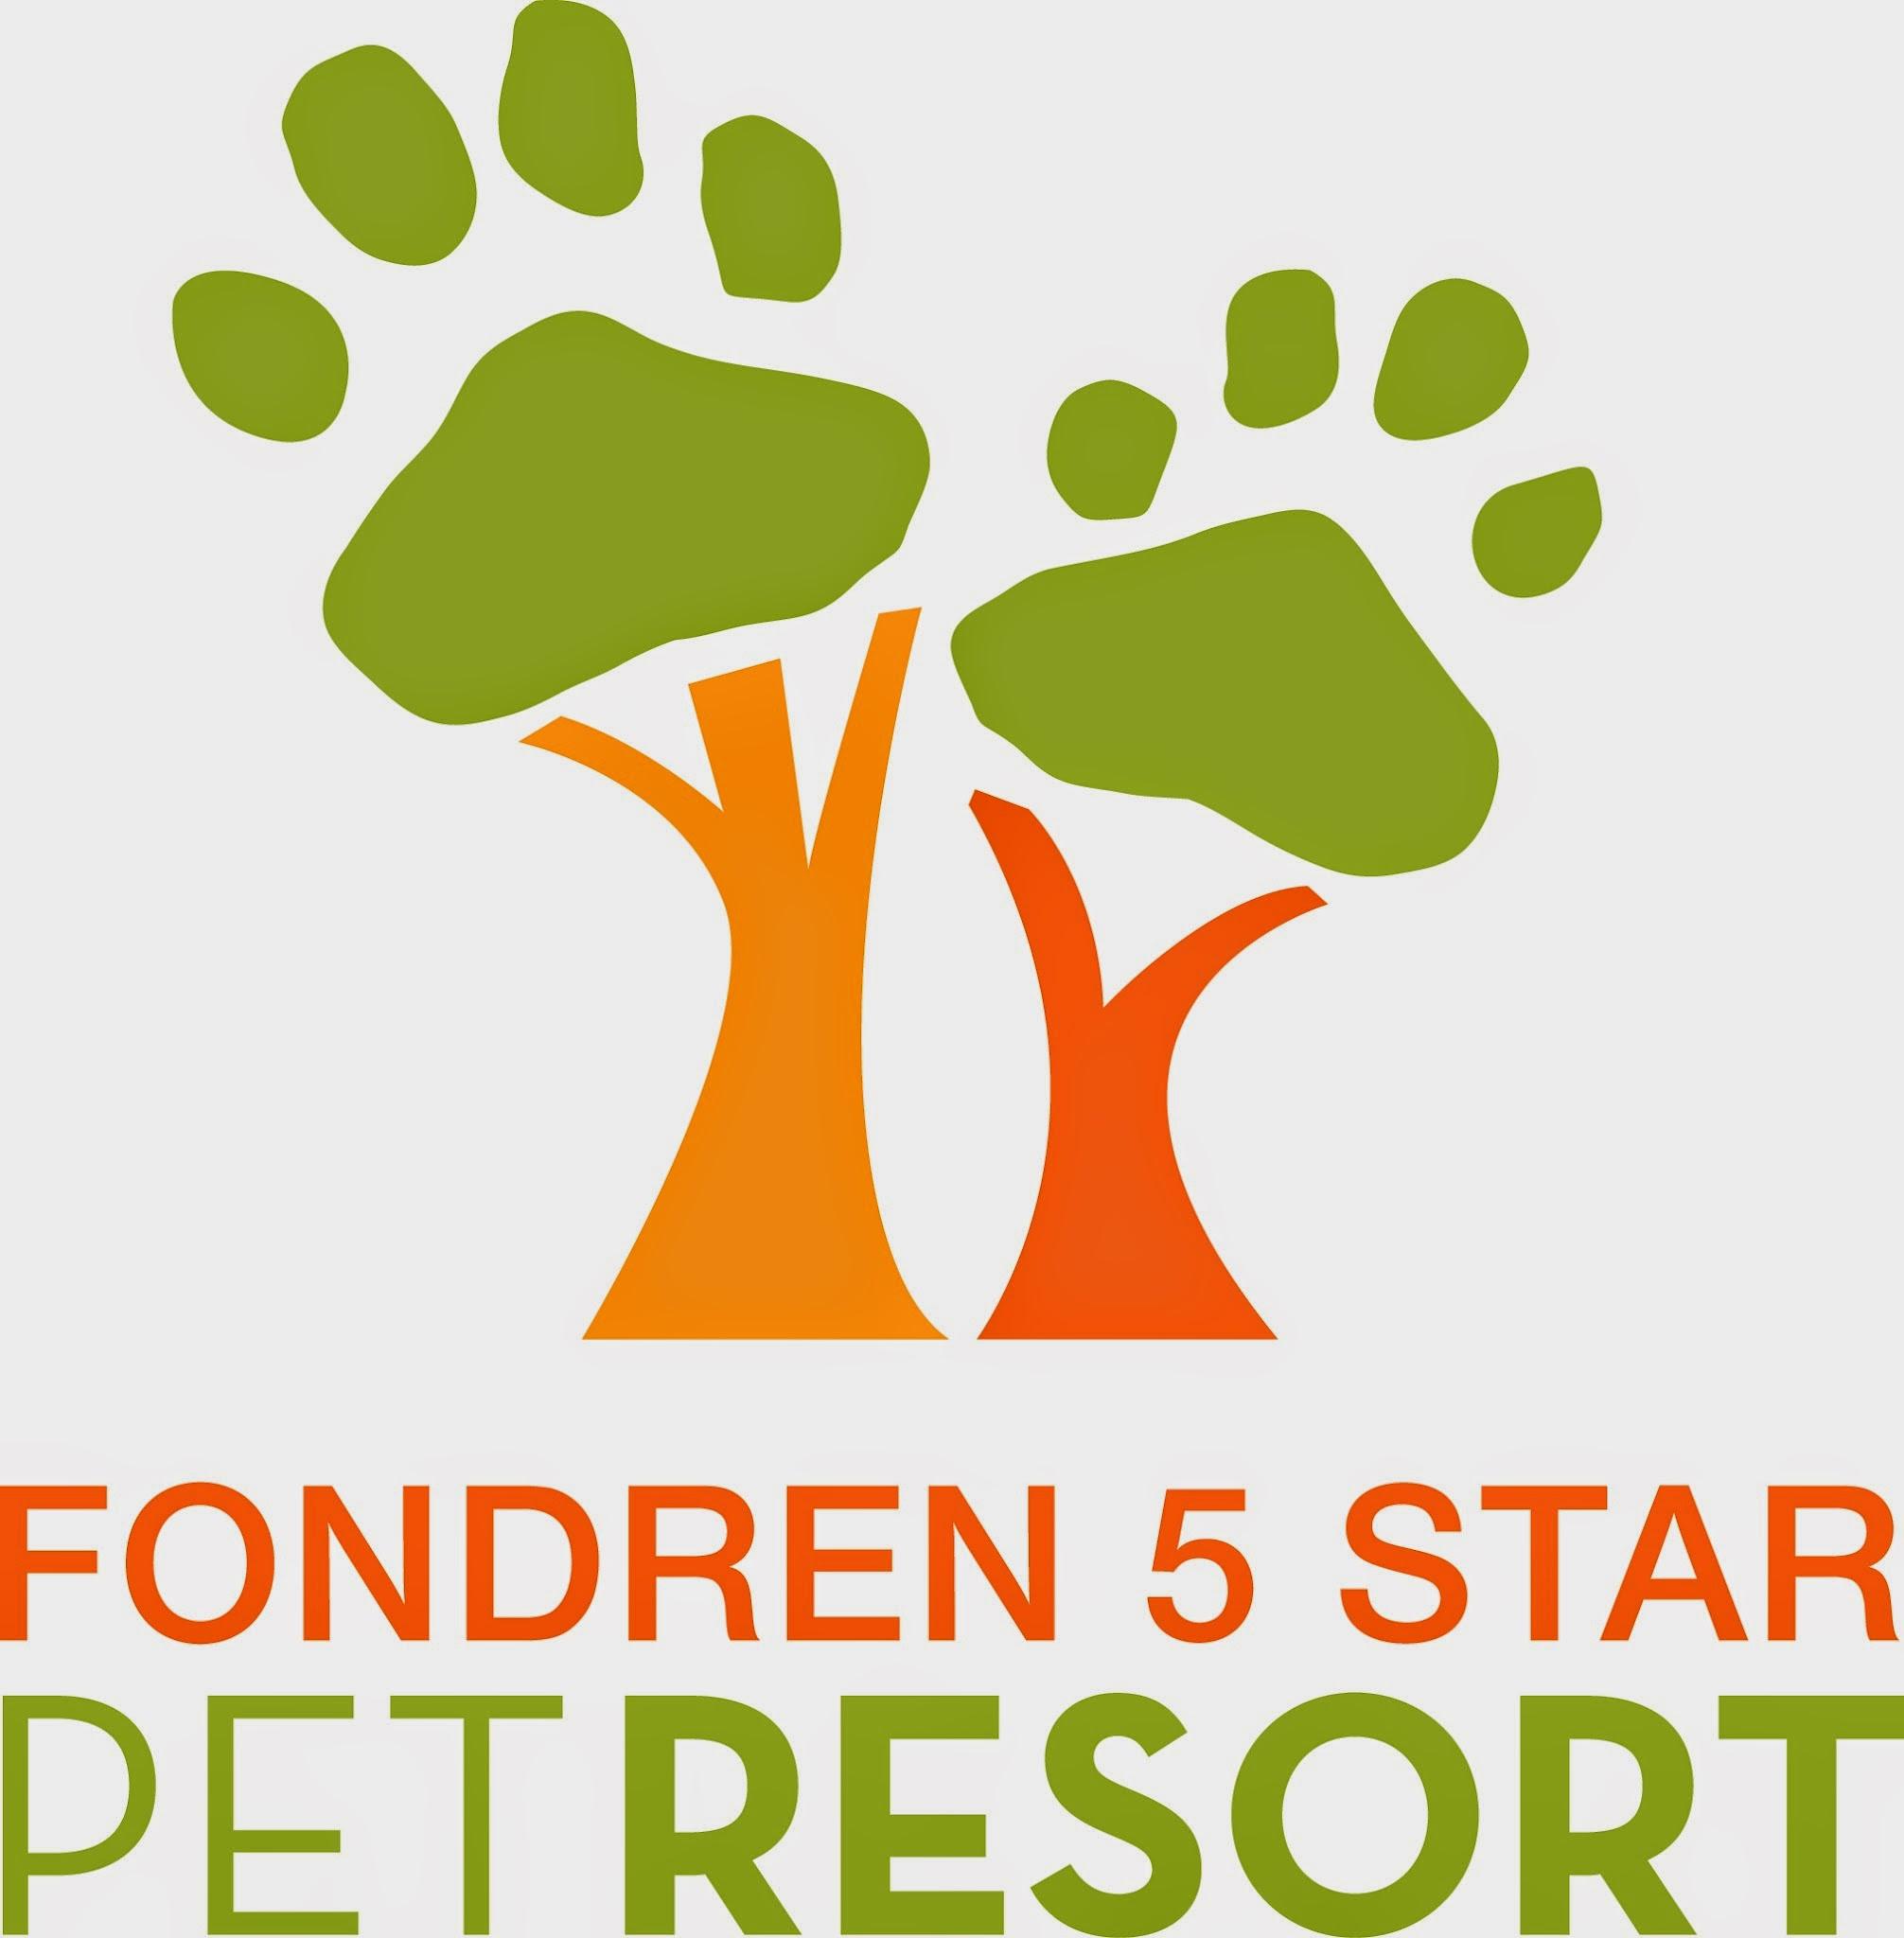 Fondren 5 star pet resort houston pettalk for Five star dog resort